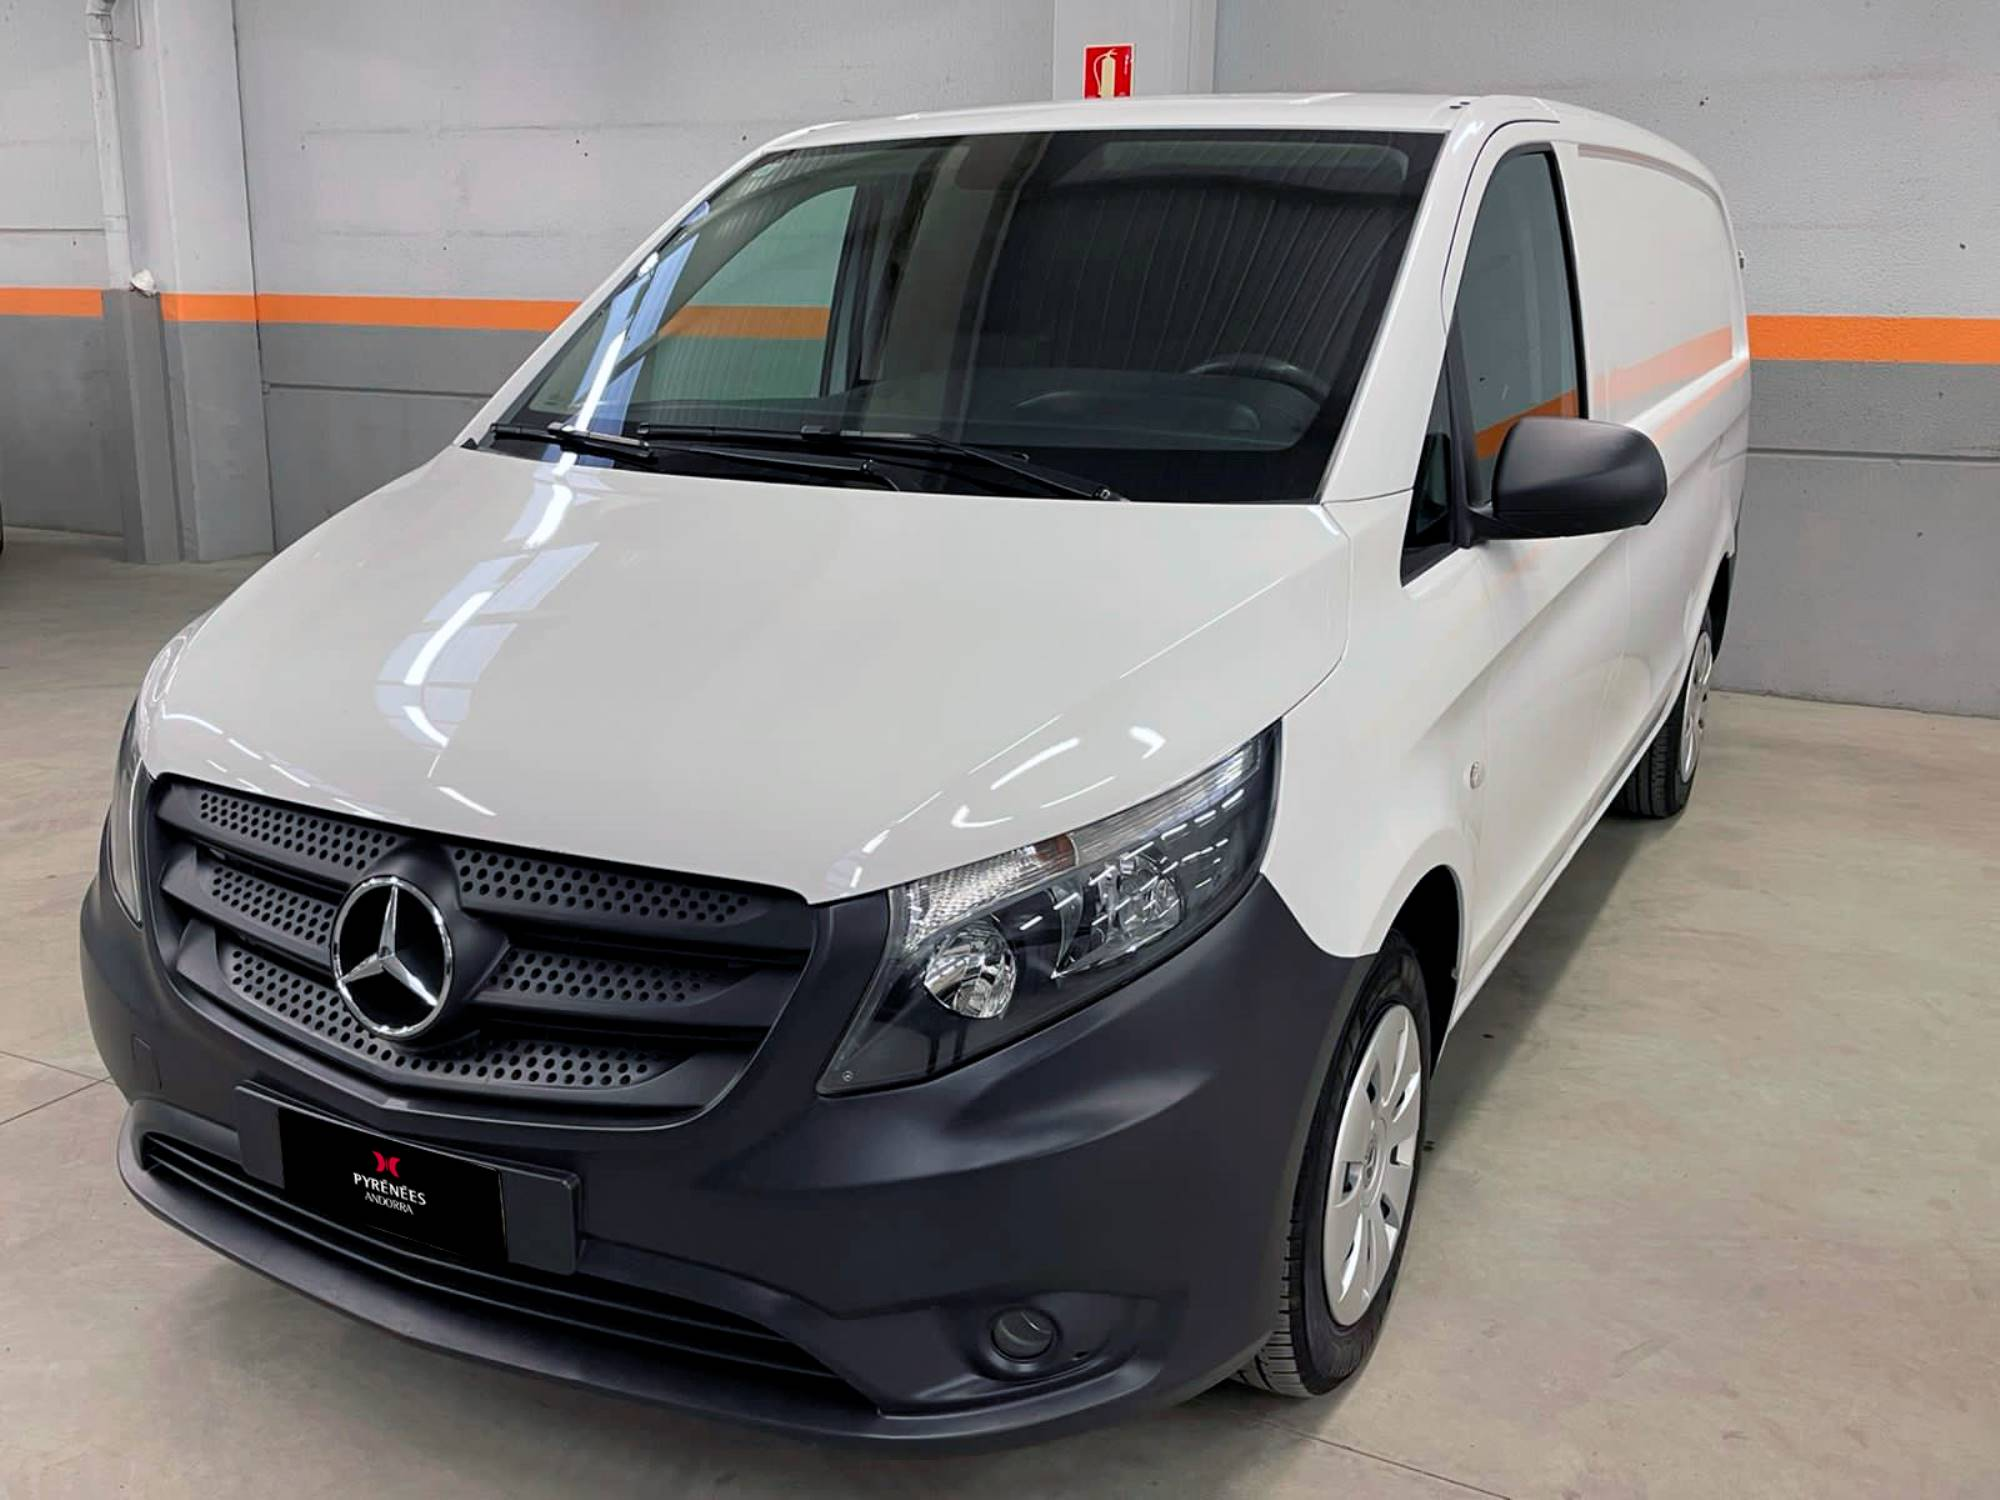 Mercedes-Benz - Vito - 111 111 Dièsel  2018  100.010 Km